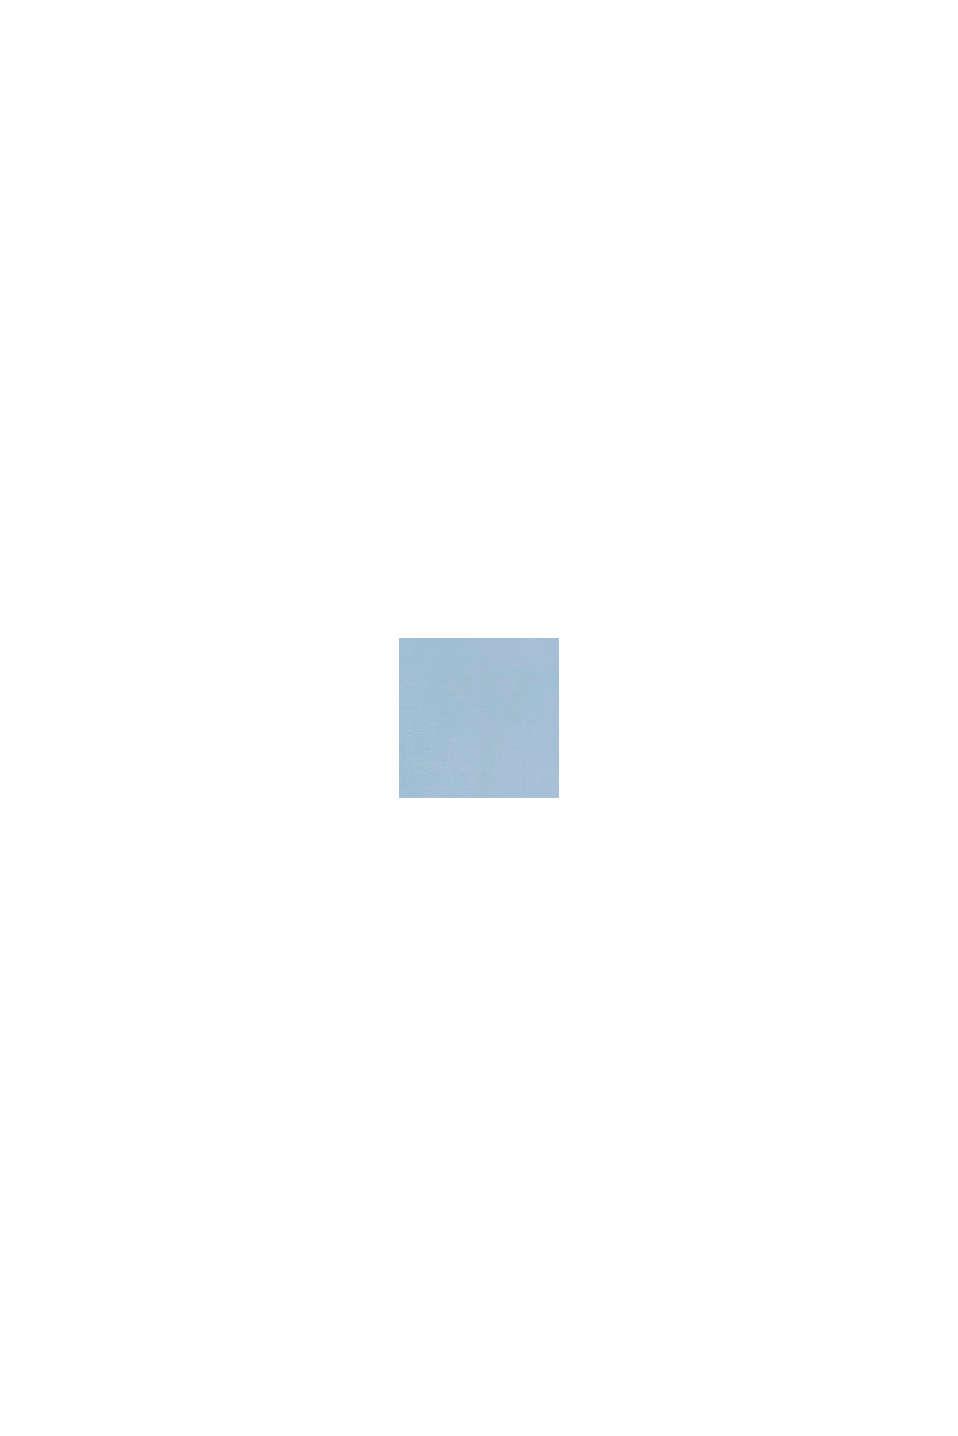 Top con spalline incrociate in cotone stretch, BLUE LAVENDER, swatch